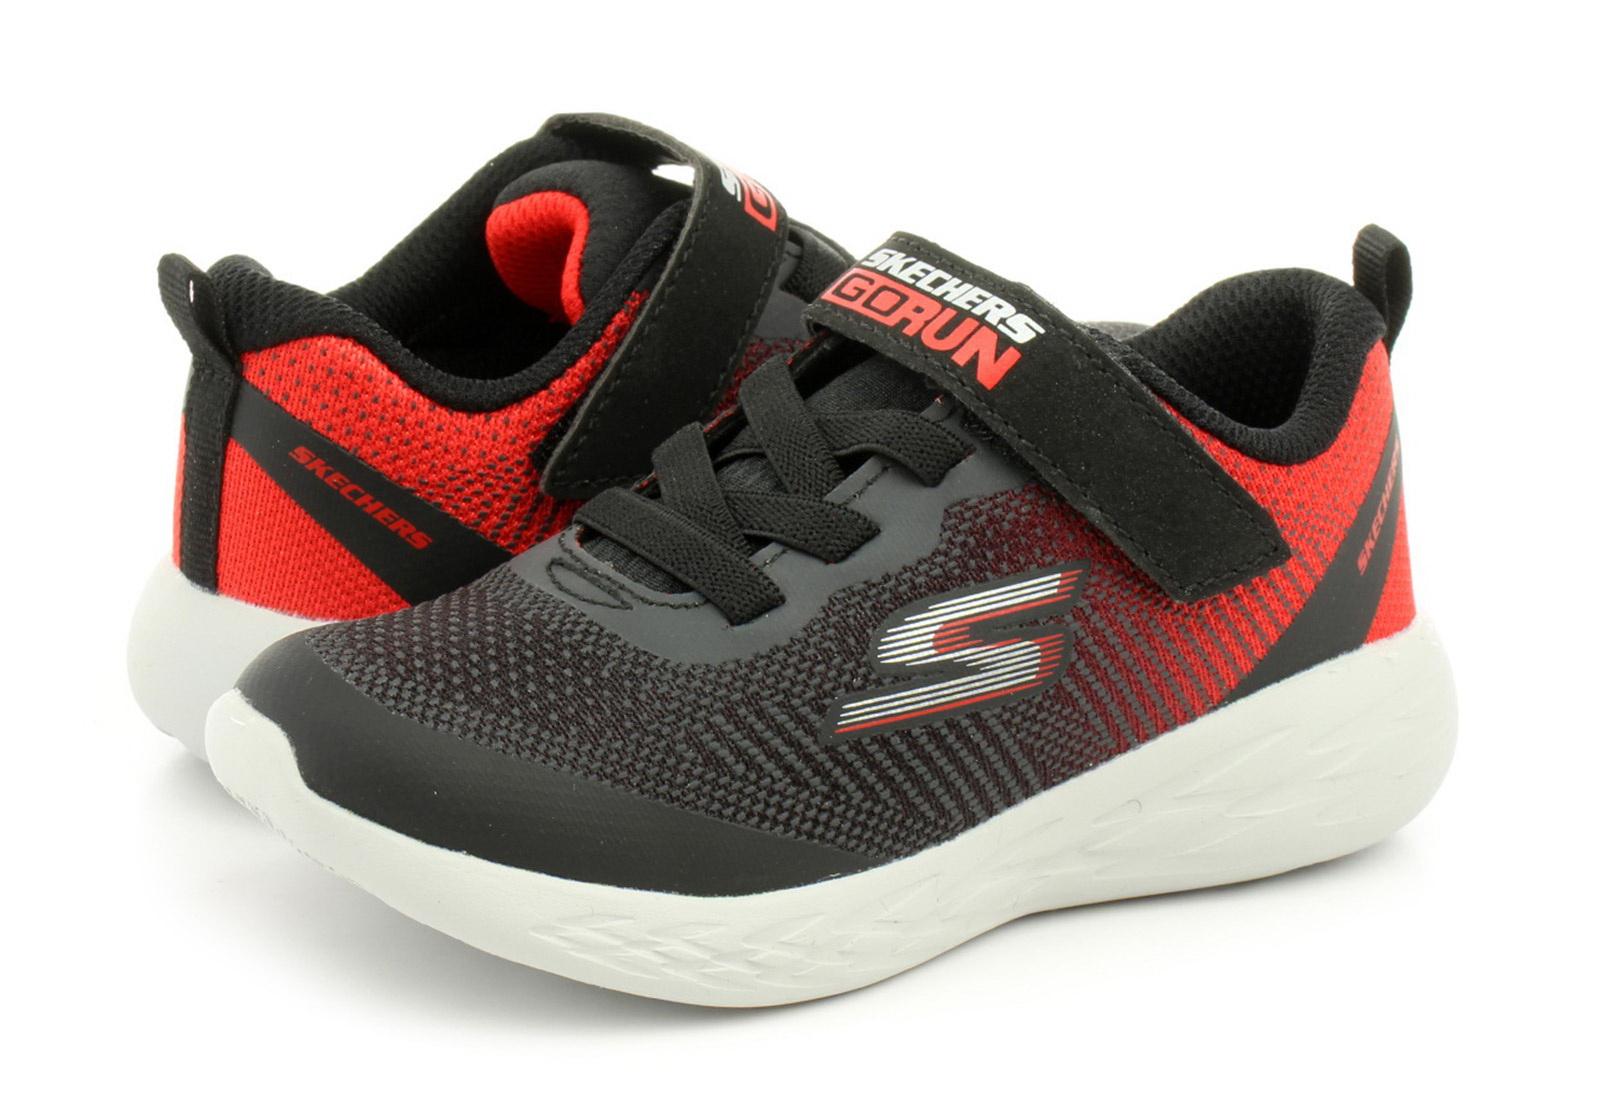 c4c158eb77 Skechers Cipő - Go Run 600 - Farrox - 97867N-bkrd - Office Shoes ...